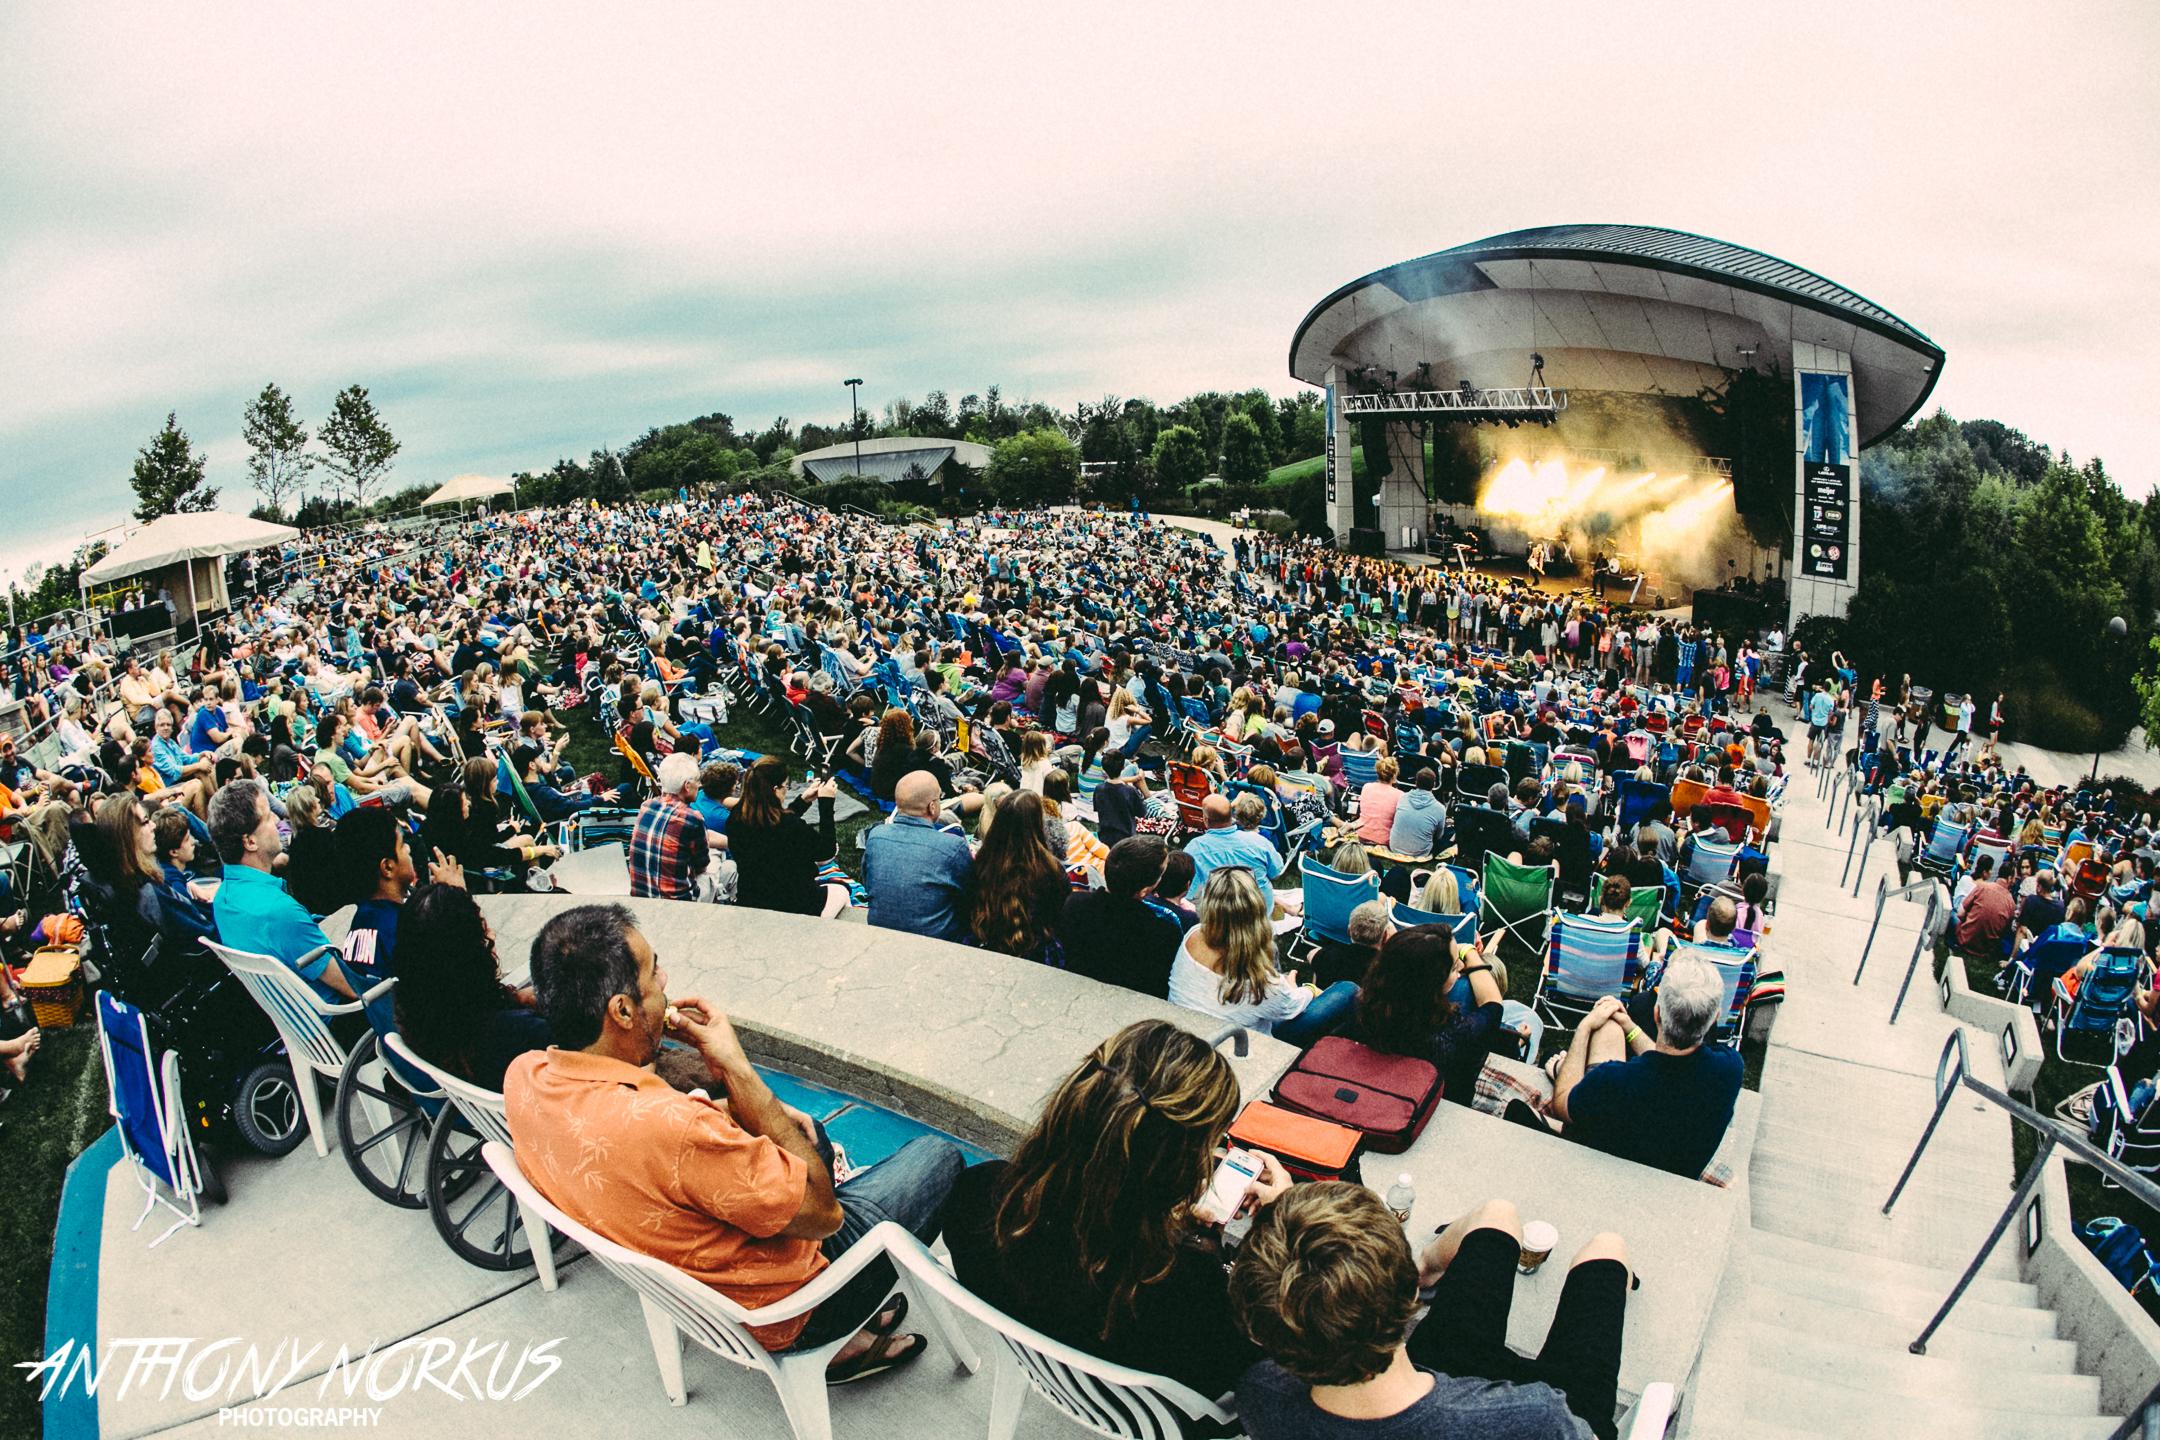 Needtobreathe Jennifer Nettles And Kc The Sunshine Band To Play Meijer Gardens Summer Concert